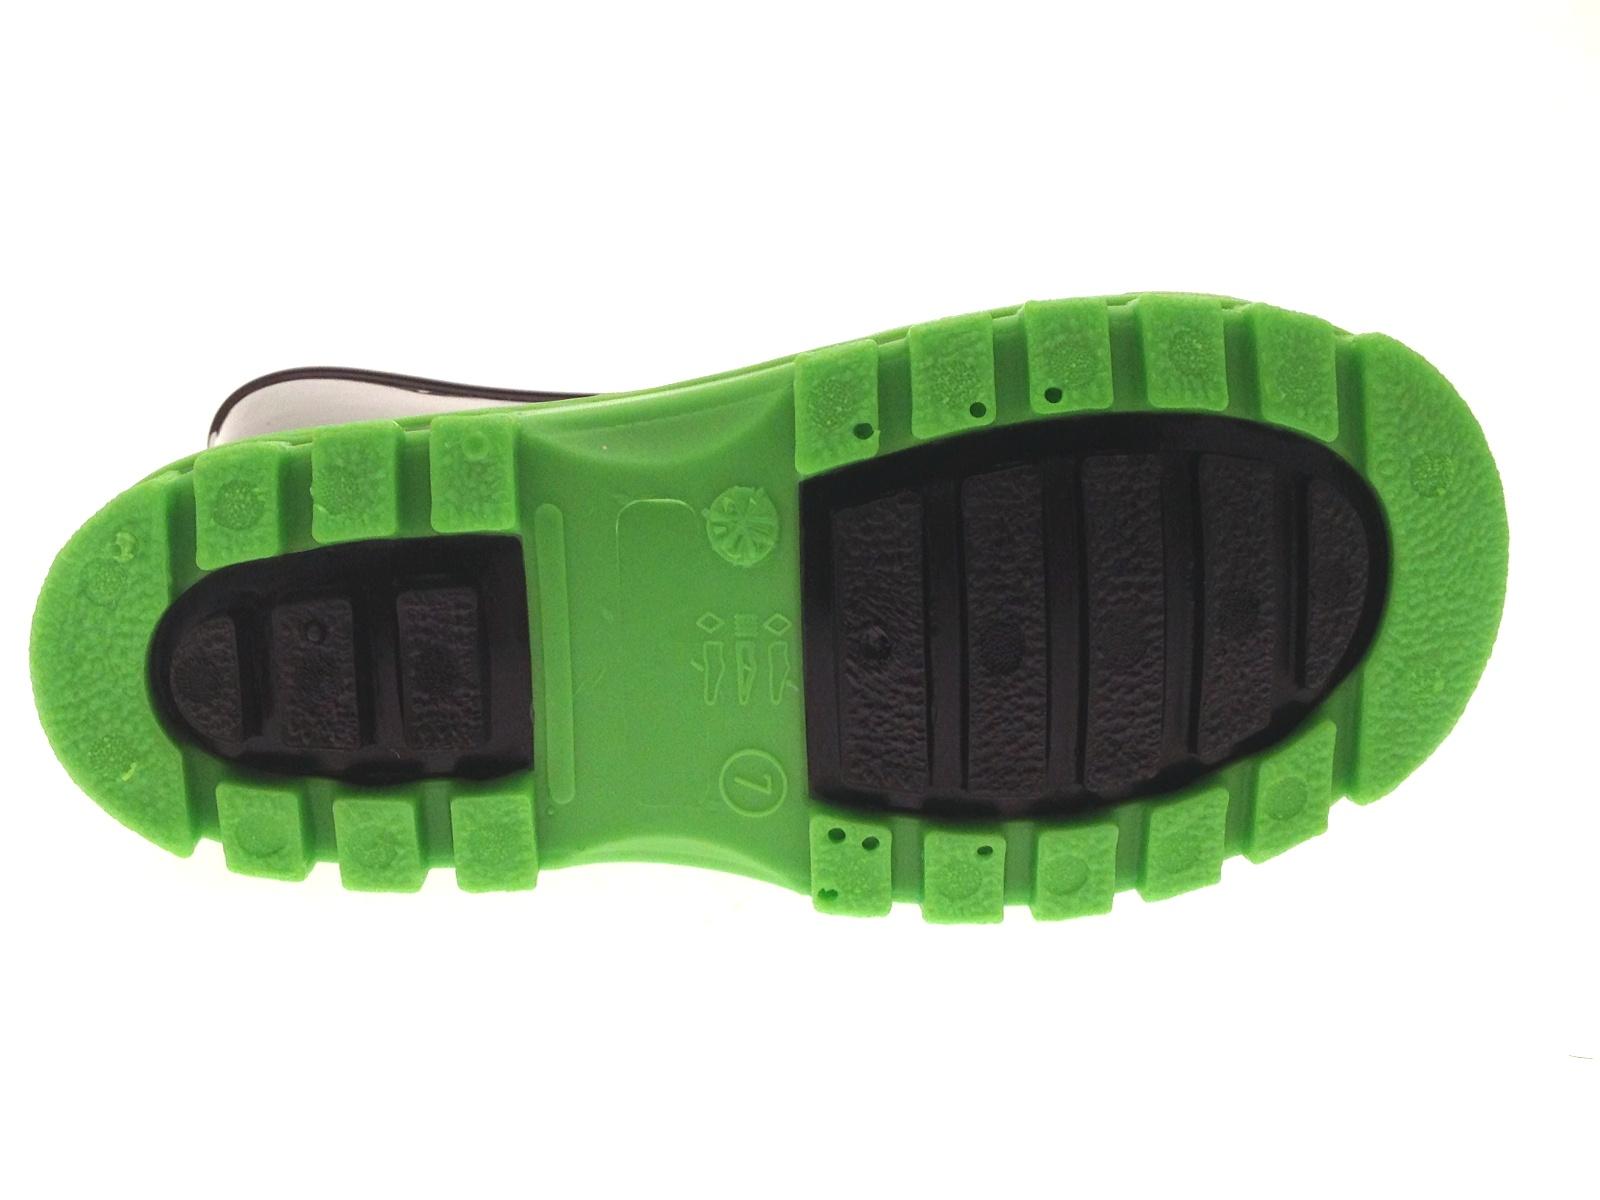 Boys Trainers Boots Shoes Teenage Mutant Ninja Turtles Size 7-1